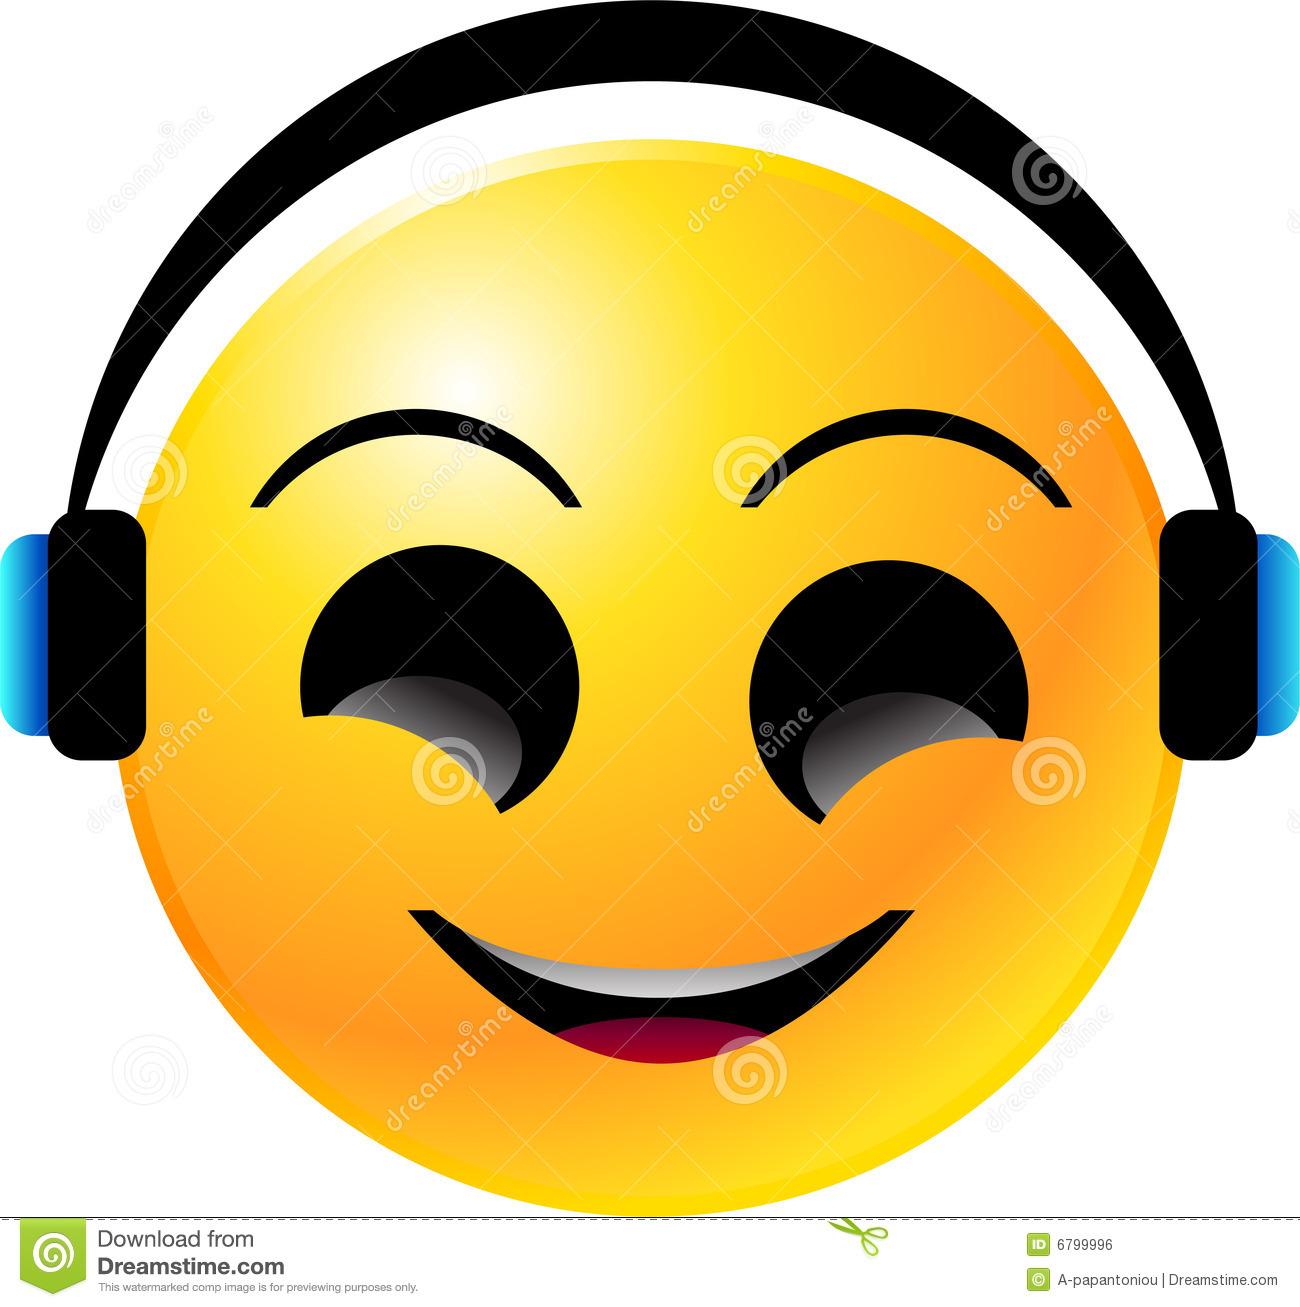 smiley face clip art% .-smiley face clip art% .-15